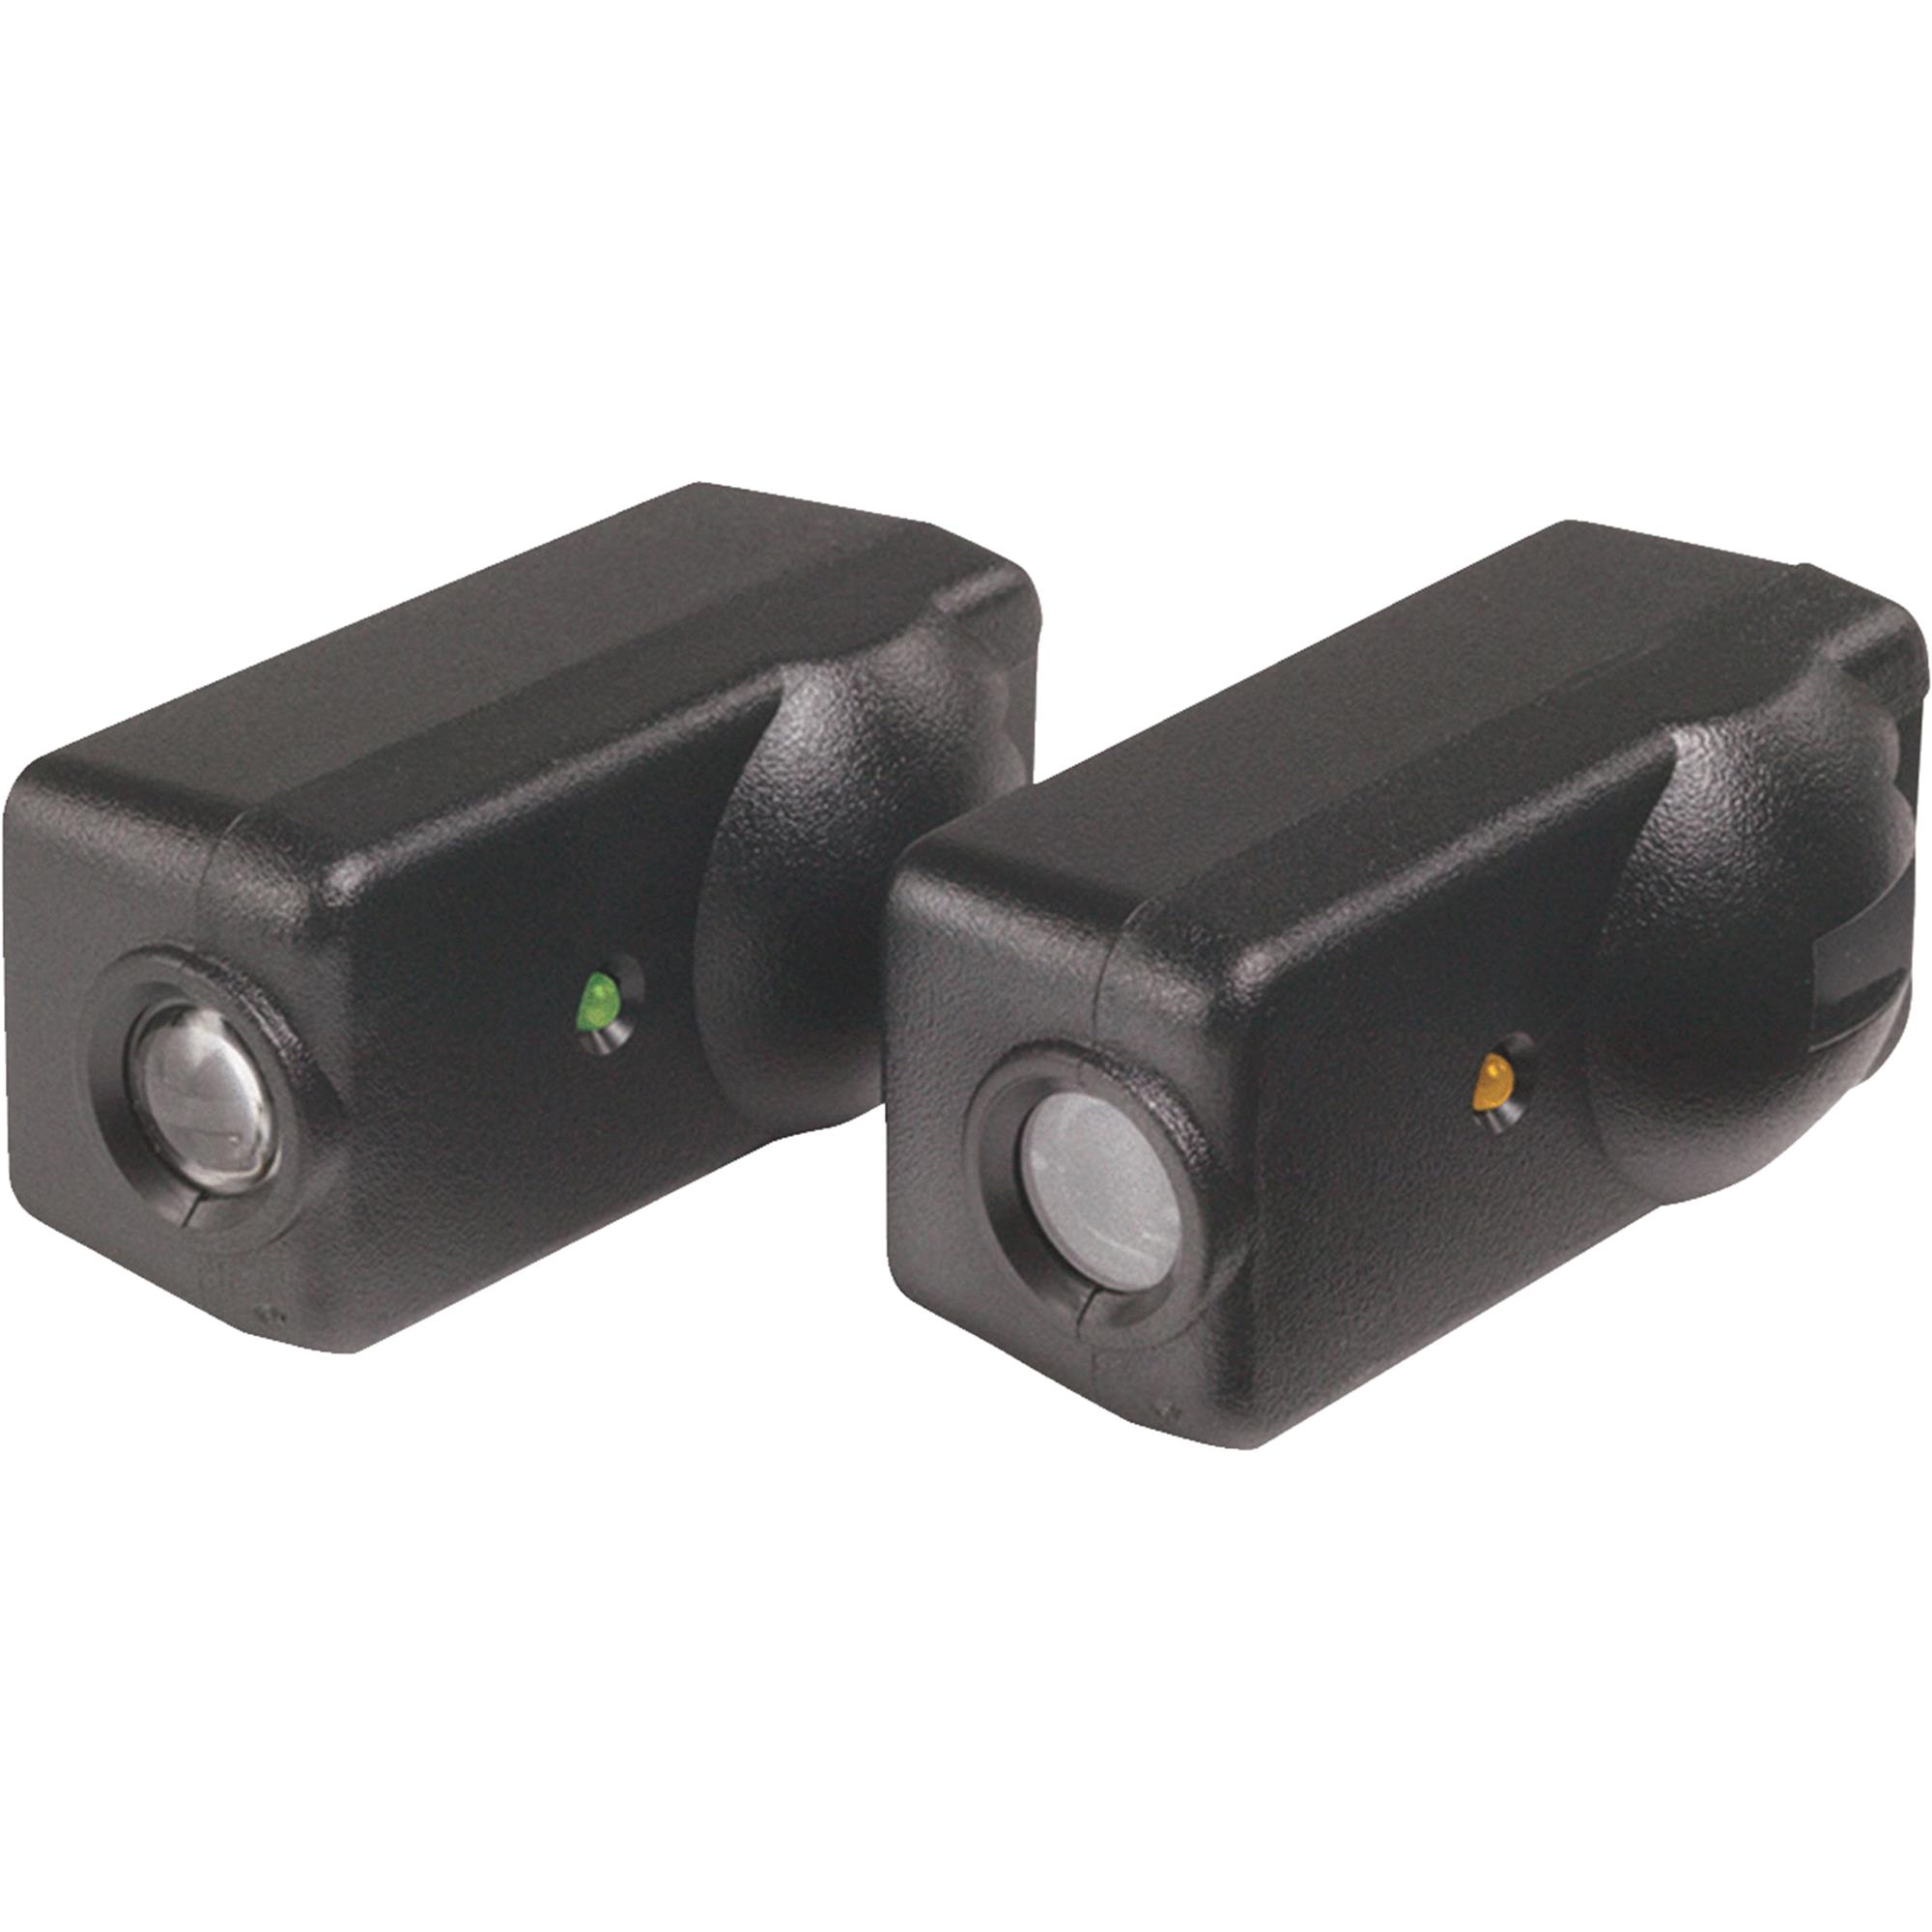 Chamberlain Replacement Safety Sensor by Chamberlain